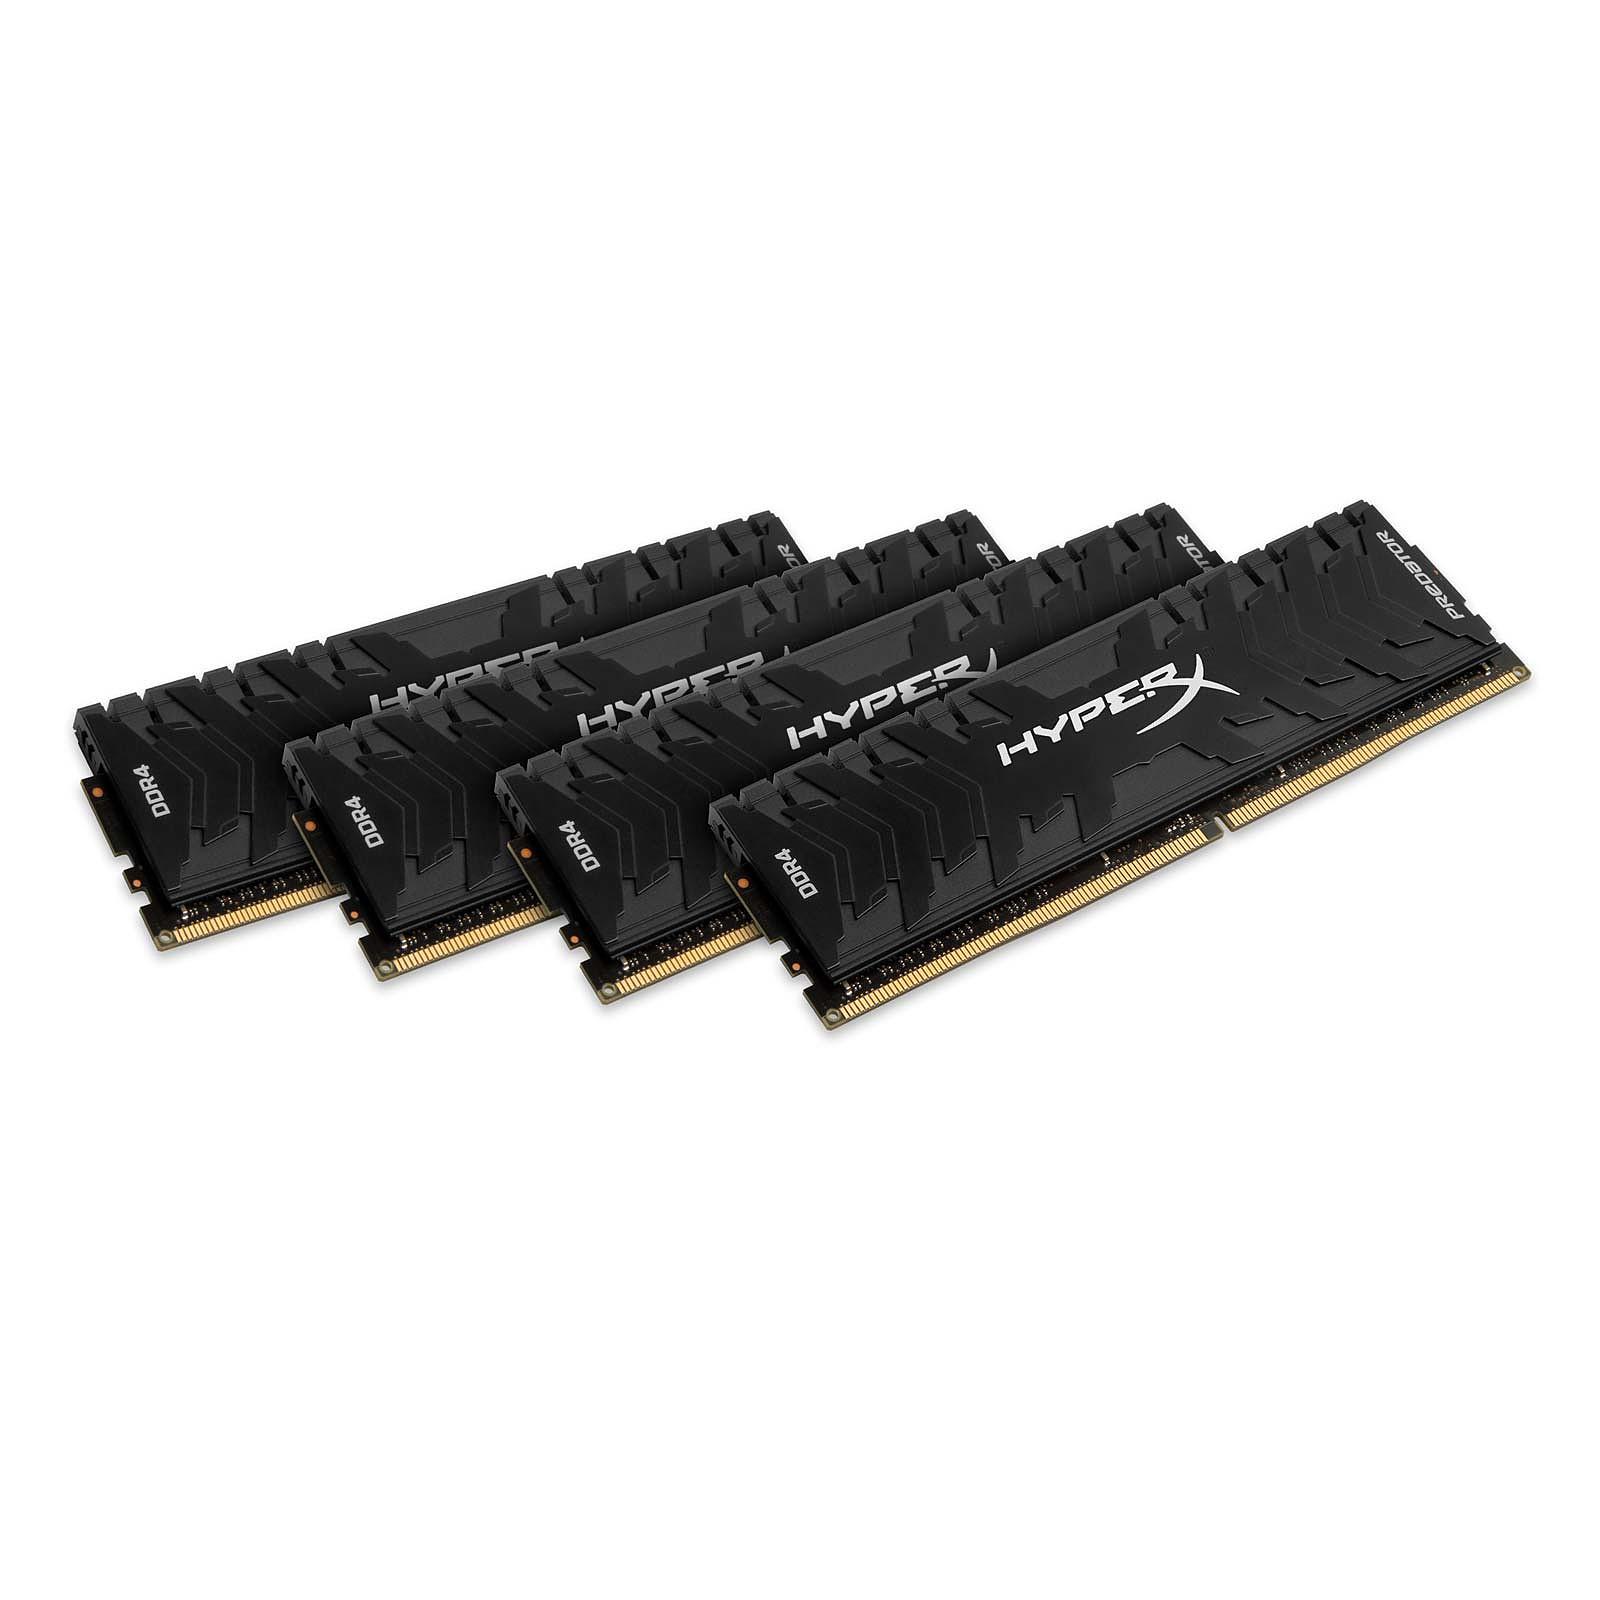 HyperX Predator Noir 32 Go (4x 8 Go) DDR4 3200 MHz CL16